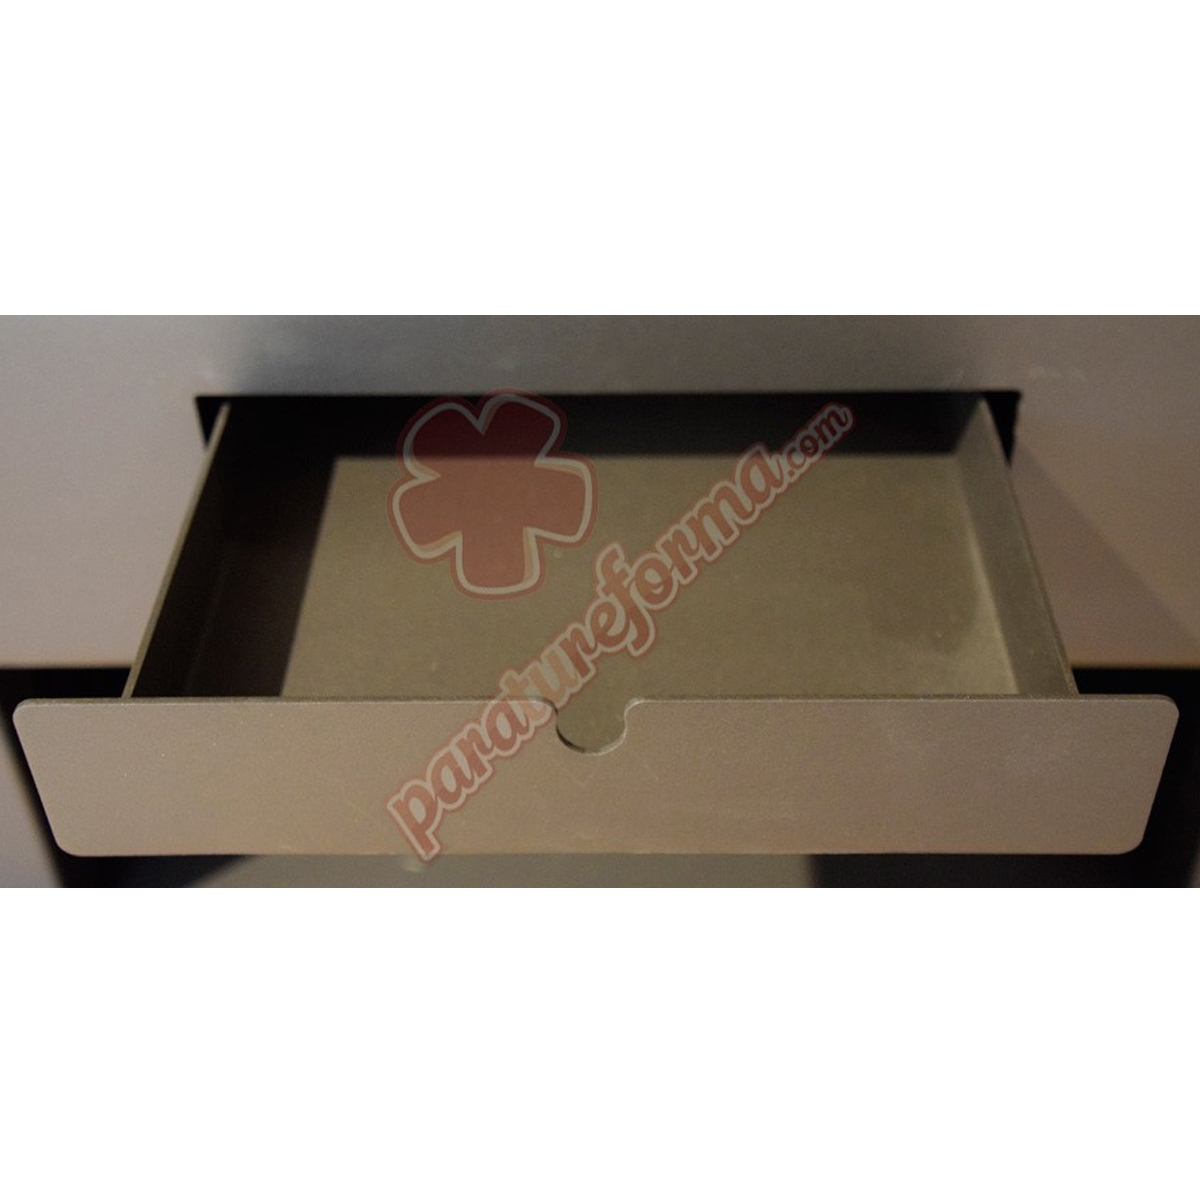 Hornos de leña FM Calefacción FM HL-100 - Horno de leña doble combustión de esquina al mejor precio